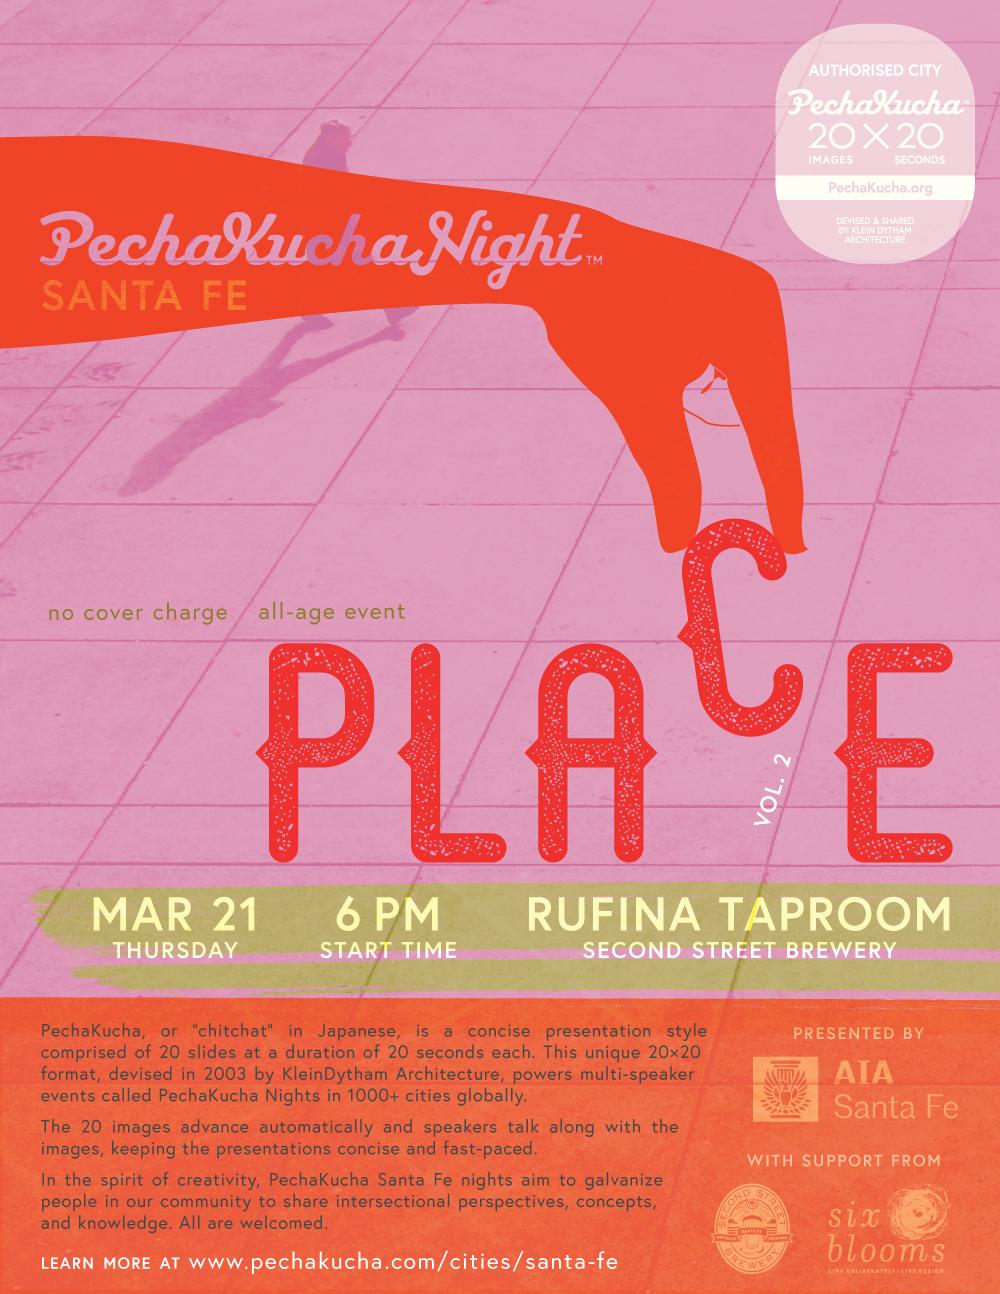 PechaKucha Santa Fe Poster Vol.2 Place